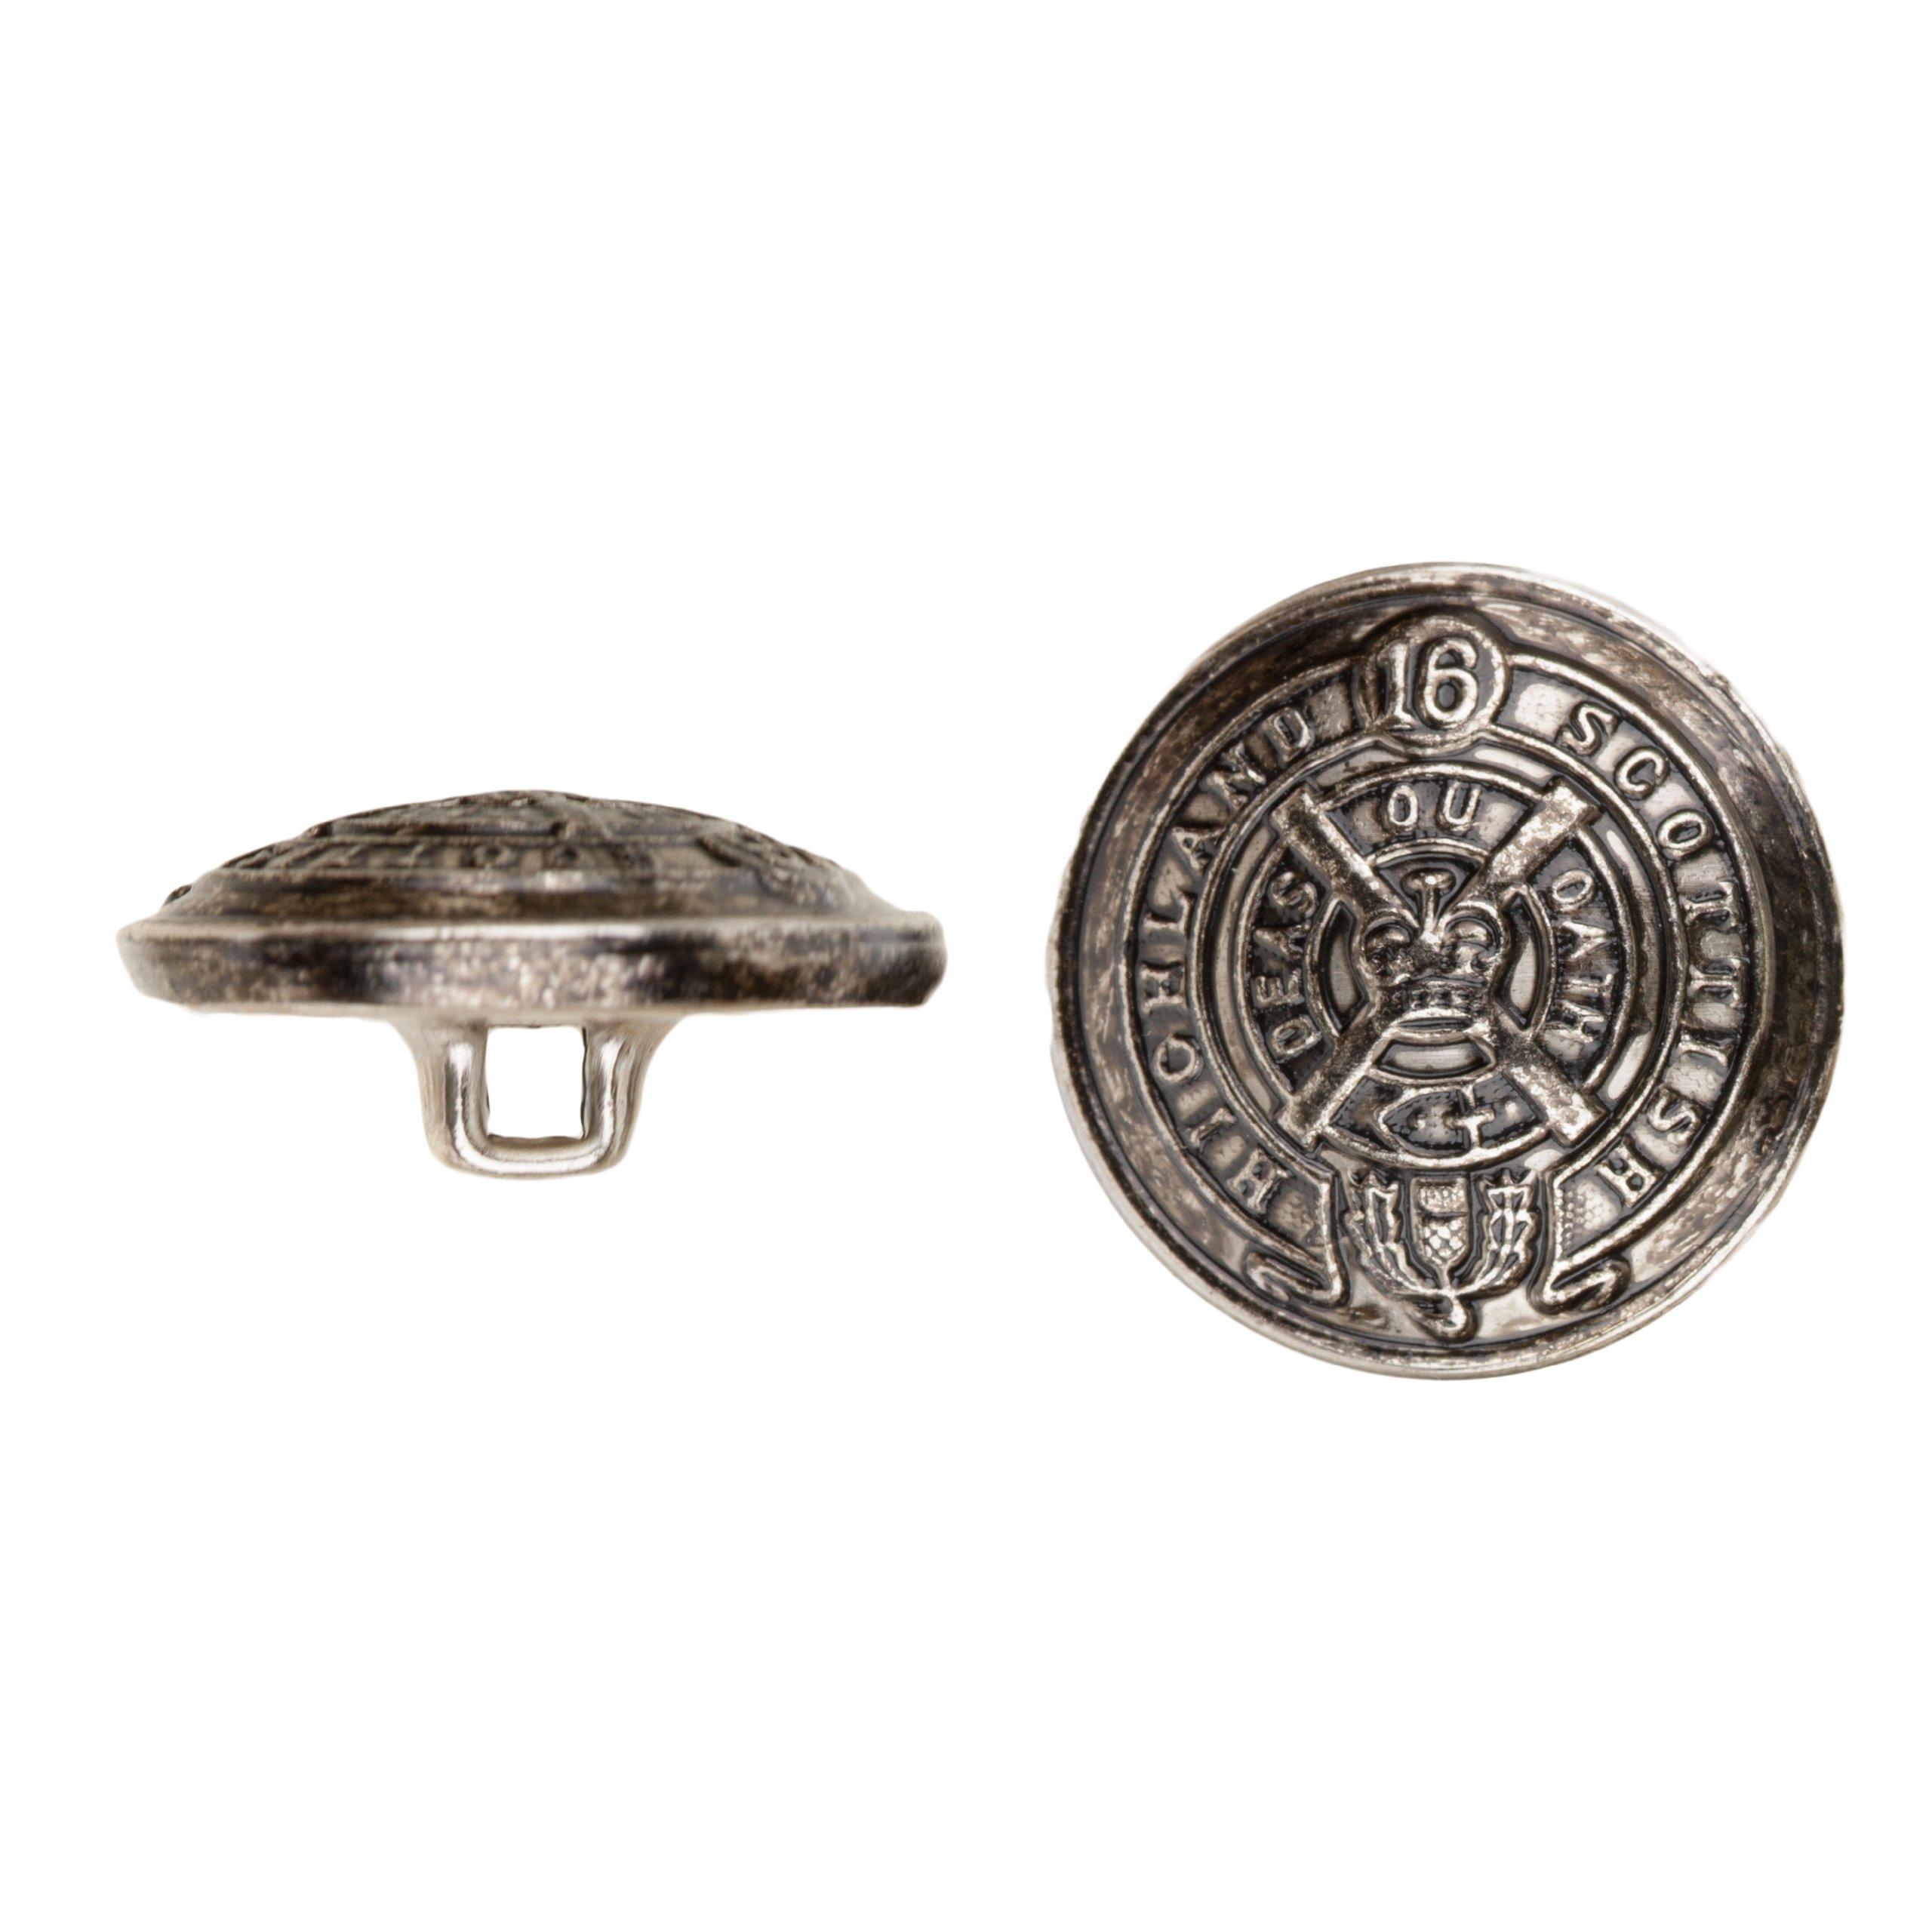 C&C Metal Products 5033 Heraldic Metal Button, Size 45 Ligne, Antique Nickel, 36-Pack